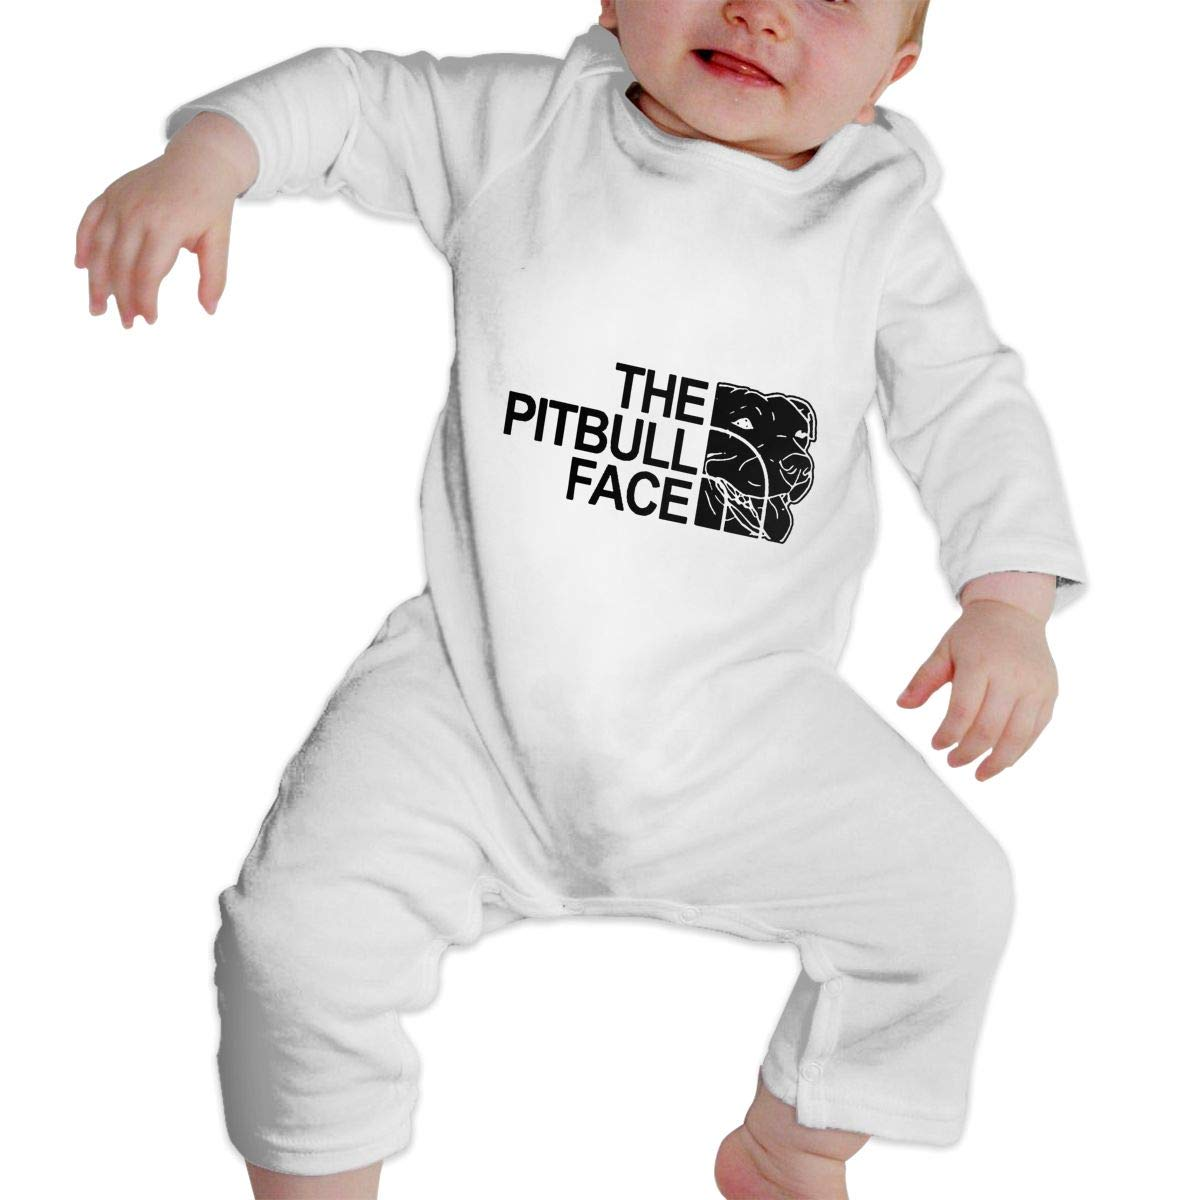 KAYERDELLE The Pitbull Face Long-Sleeve Unisex Baby Bodysuits for 6-24 Months Infant